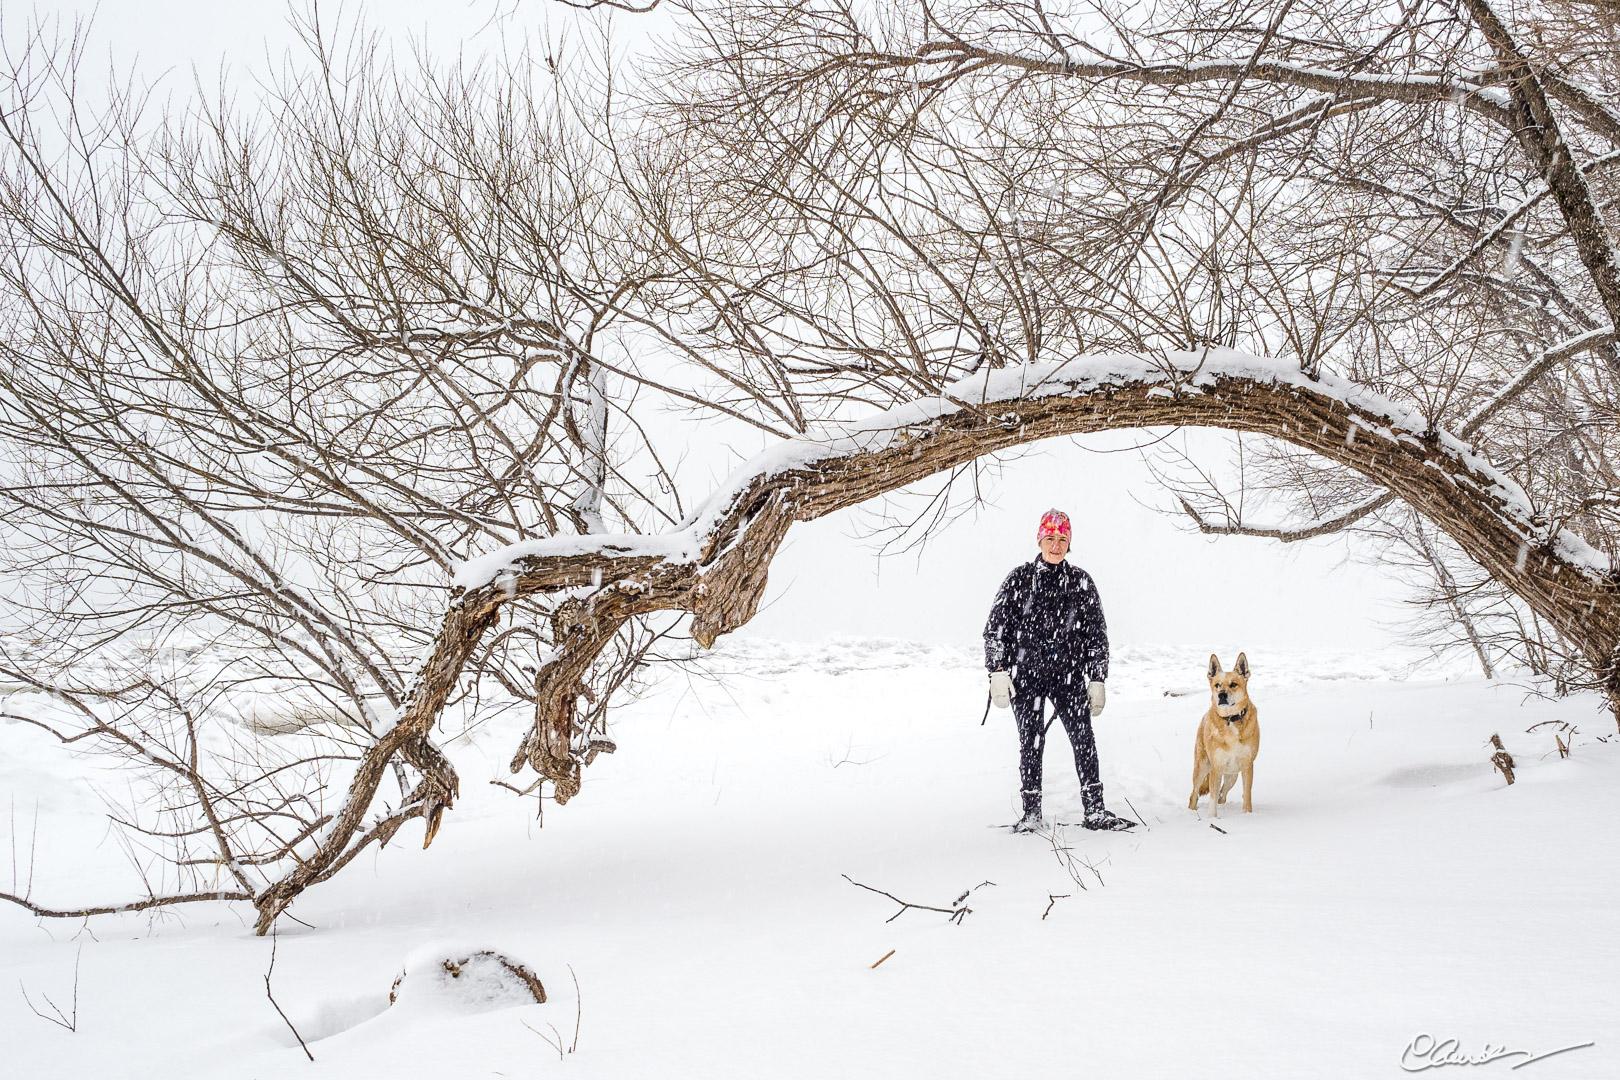 Jour d'hiver / Winter has arrived